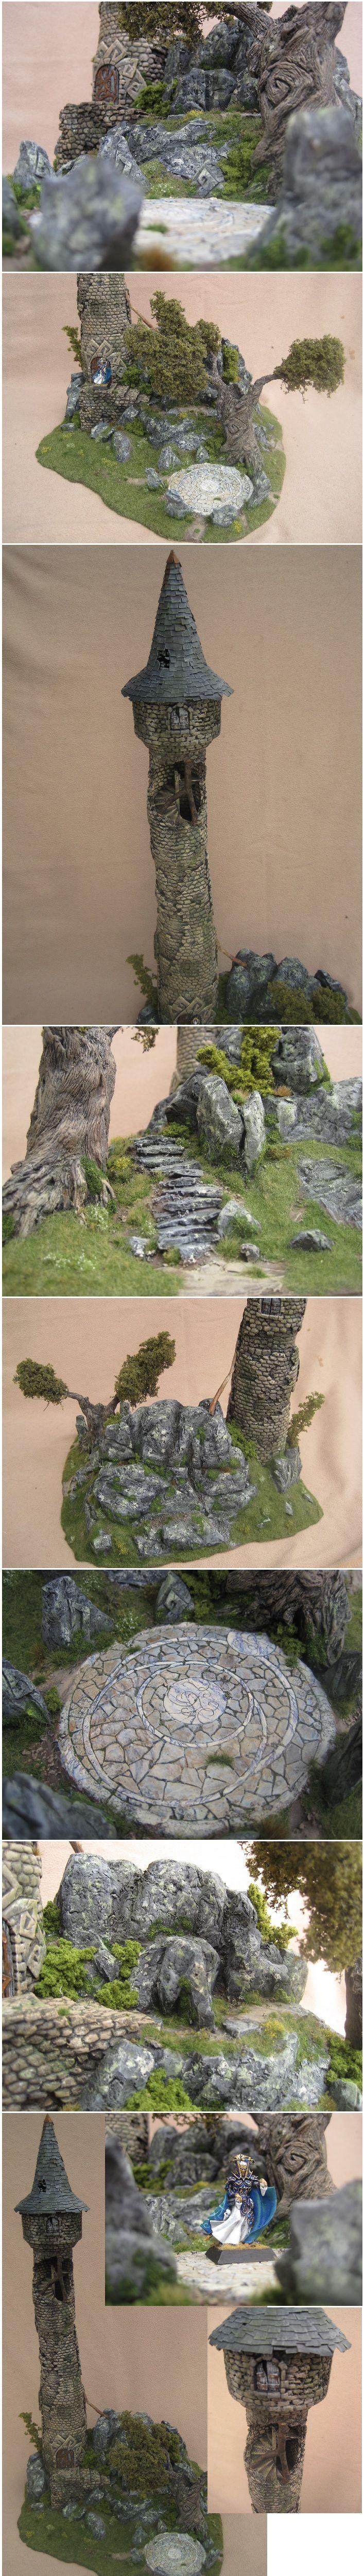 Wizard's Tower - by Zaboobadidoo